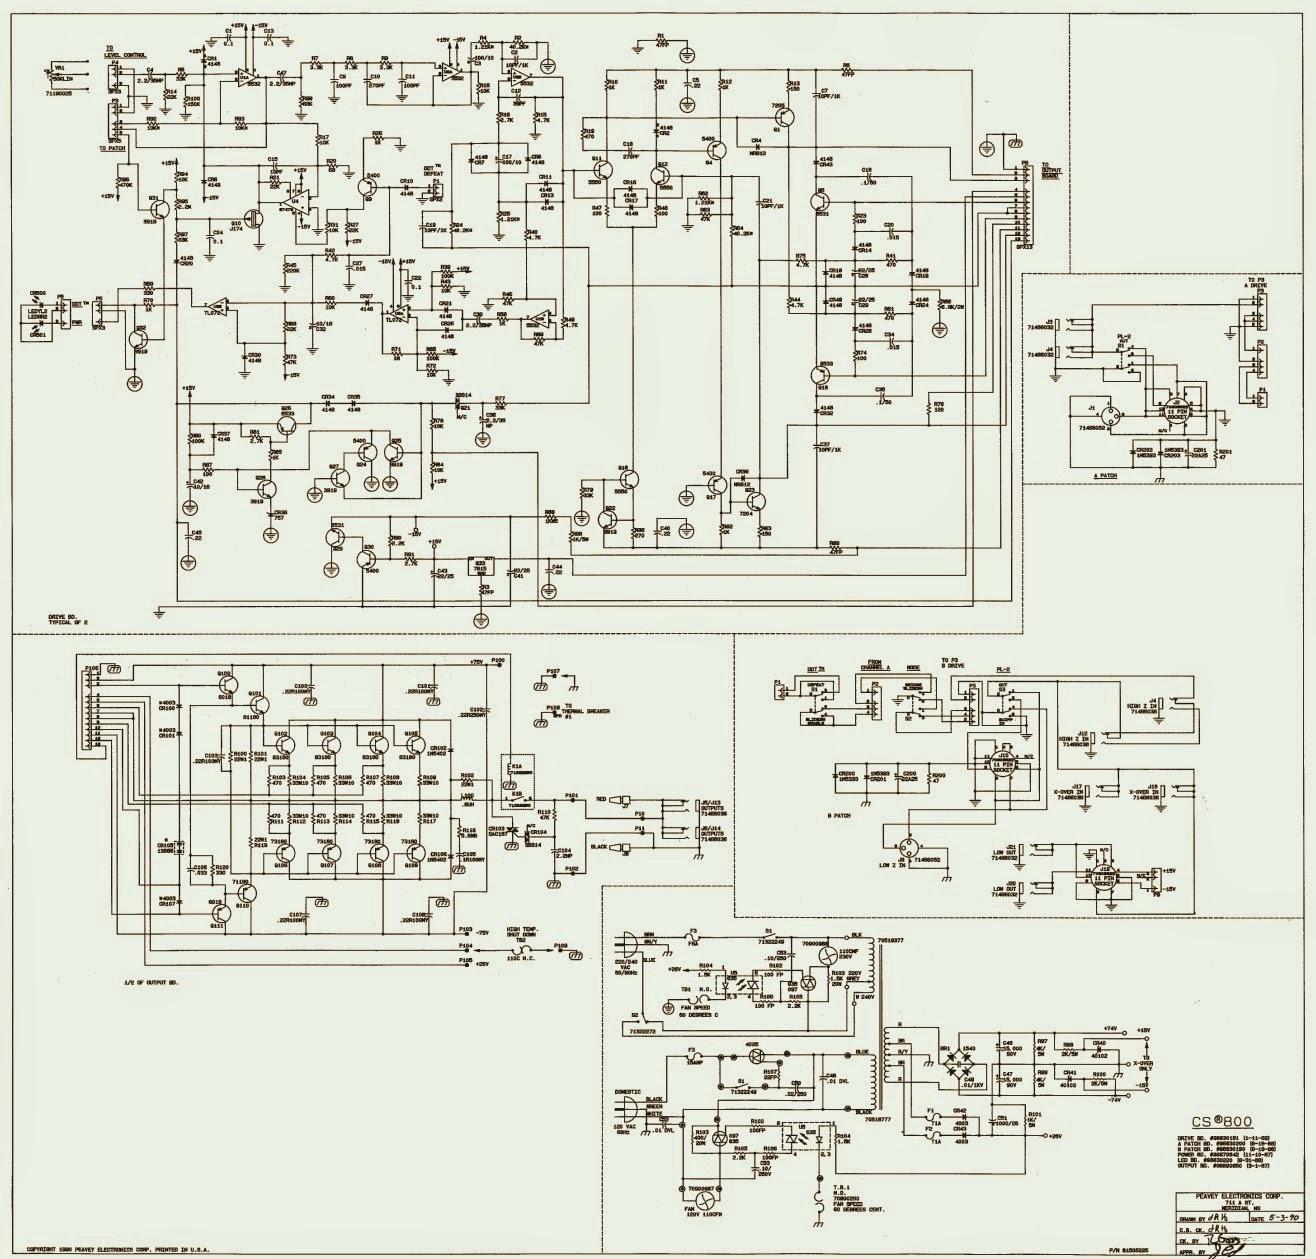 small resolution of peavey cs 800 diagram schematic wiring diagrams u2022 gibson wiring diagrams peavey wiring diagrams